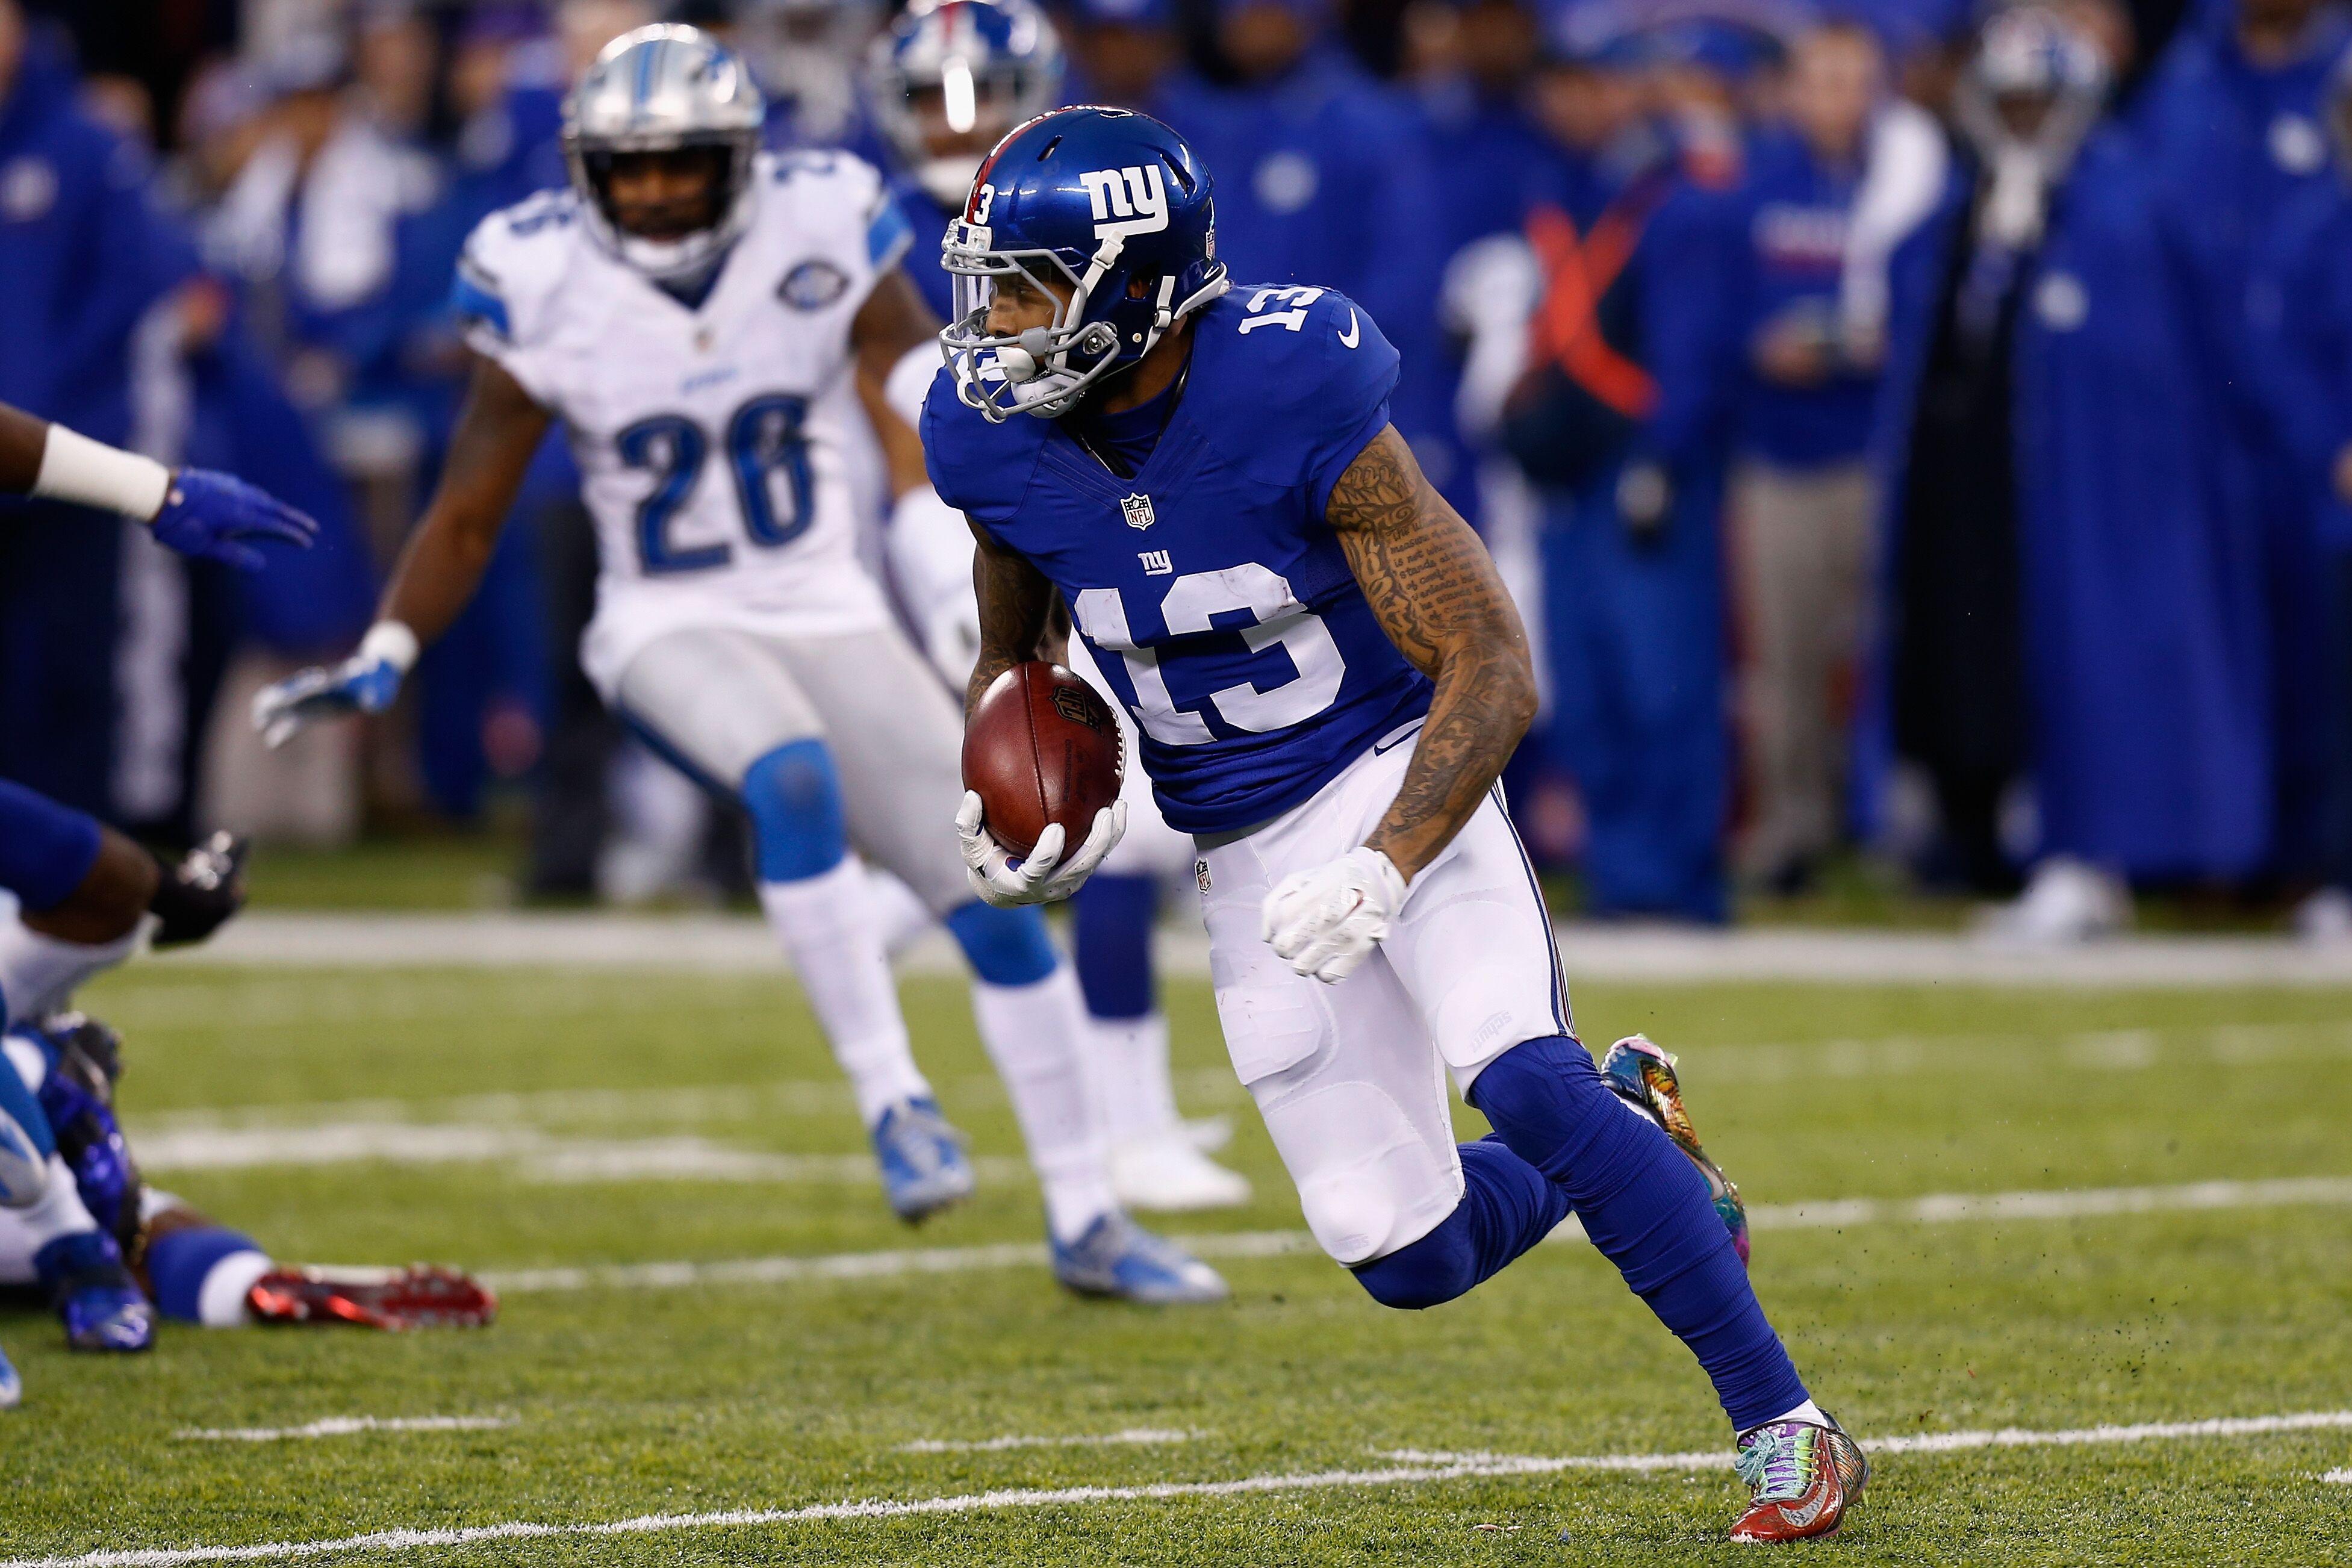 ac37191b124 New York Giants: No urgency needed for Odell Beckham Jr. deal